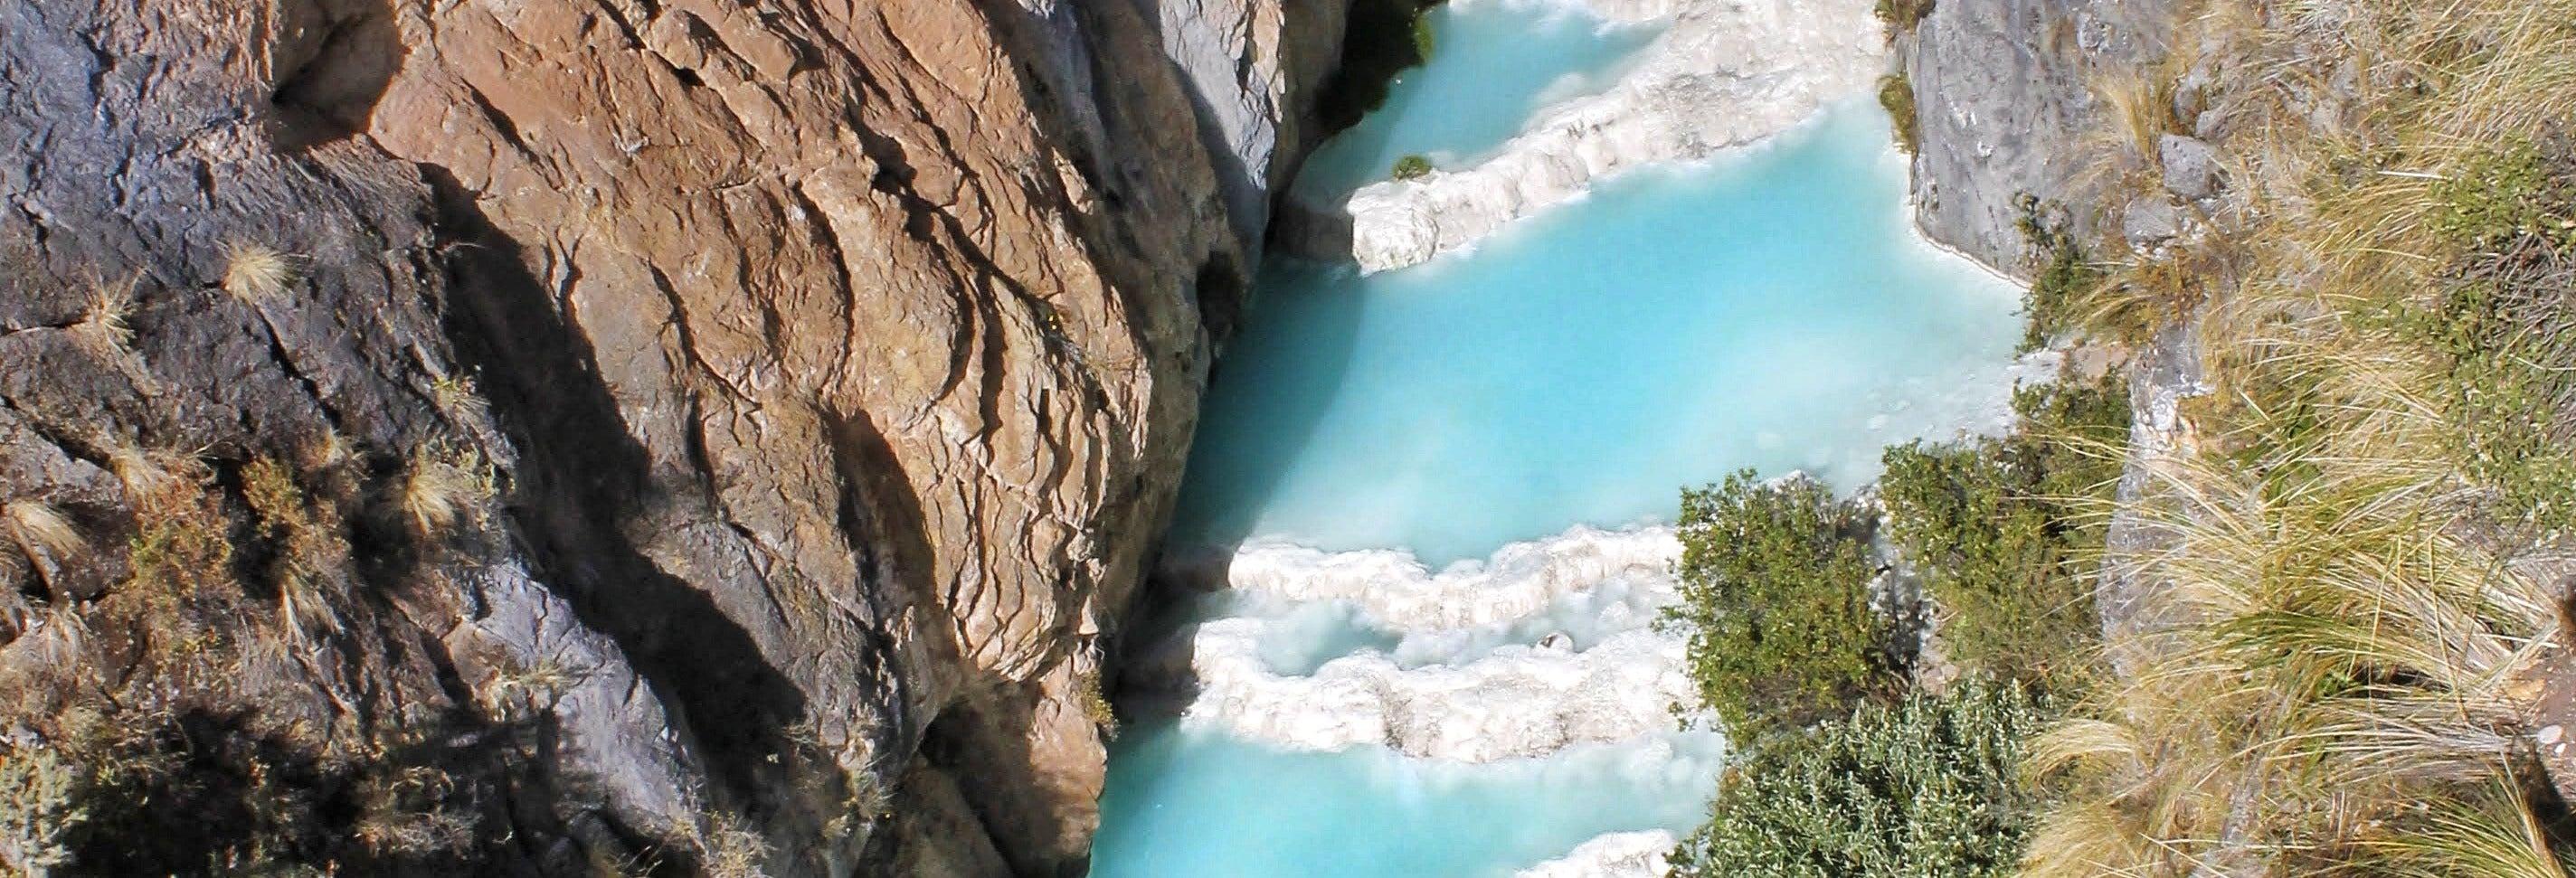 Excursión a las Aguas Turquesas de Millpu